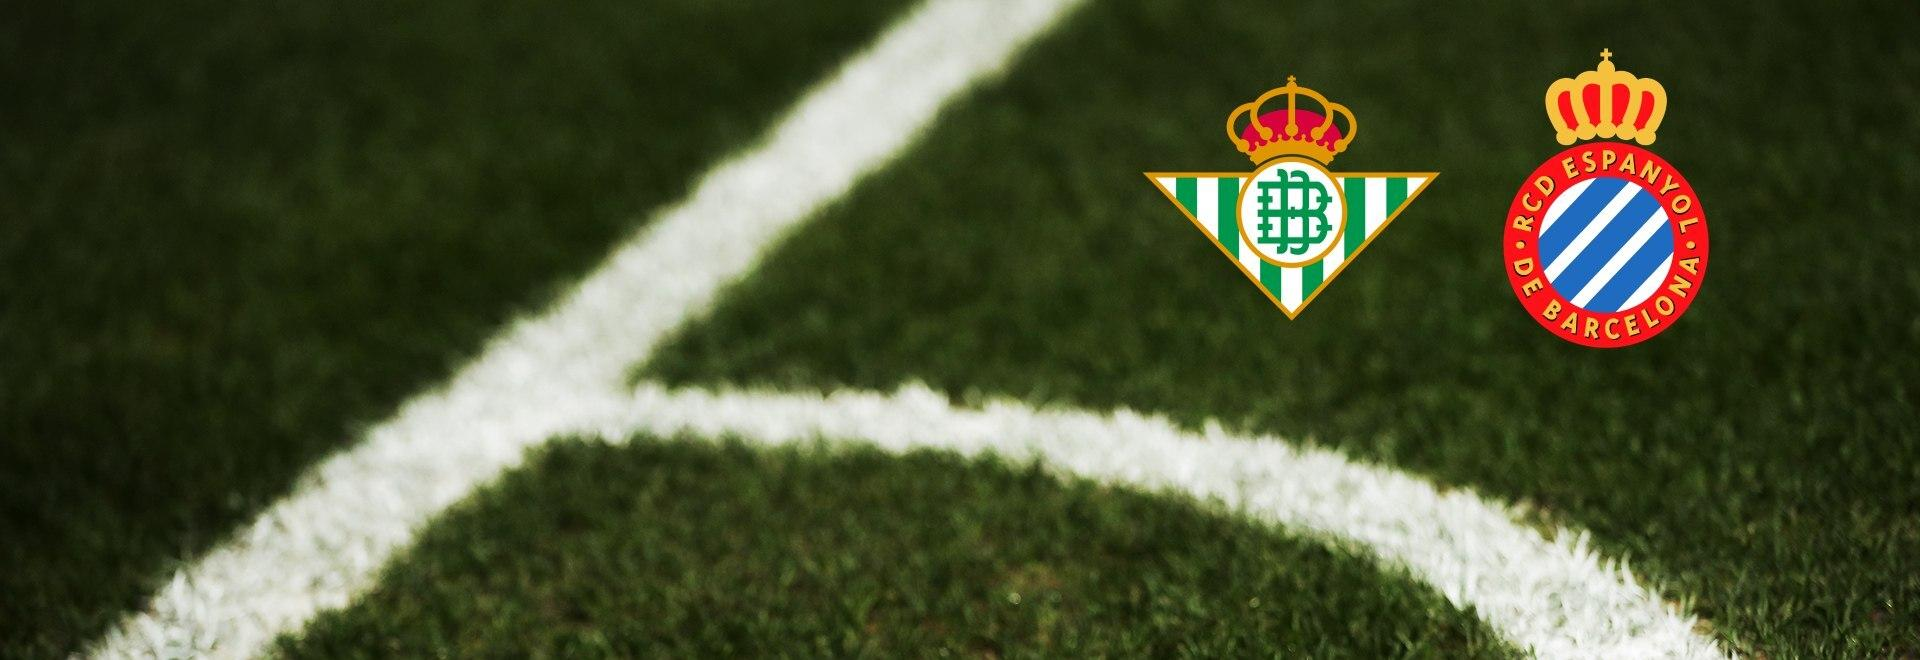 Real Betis - Espanyol. 31a g.